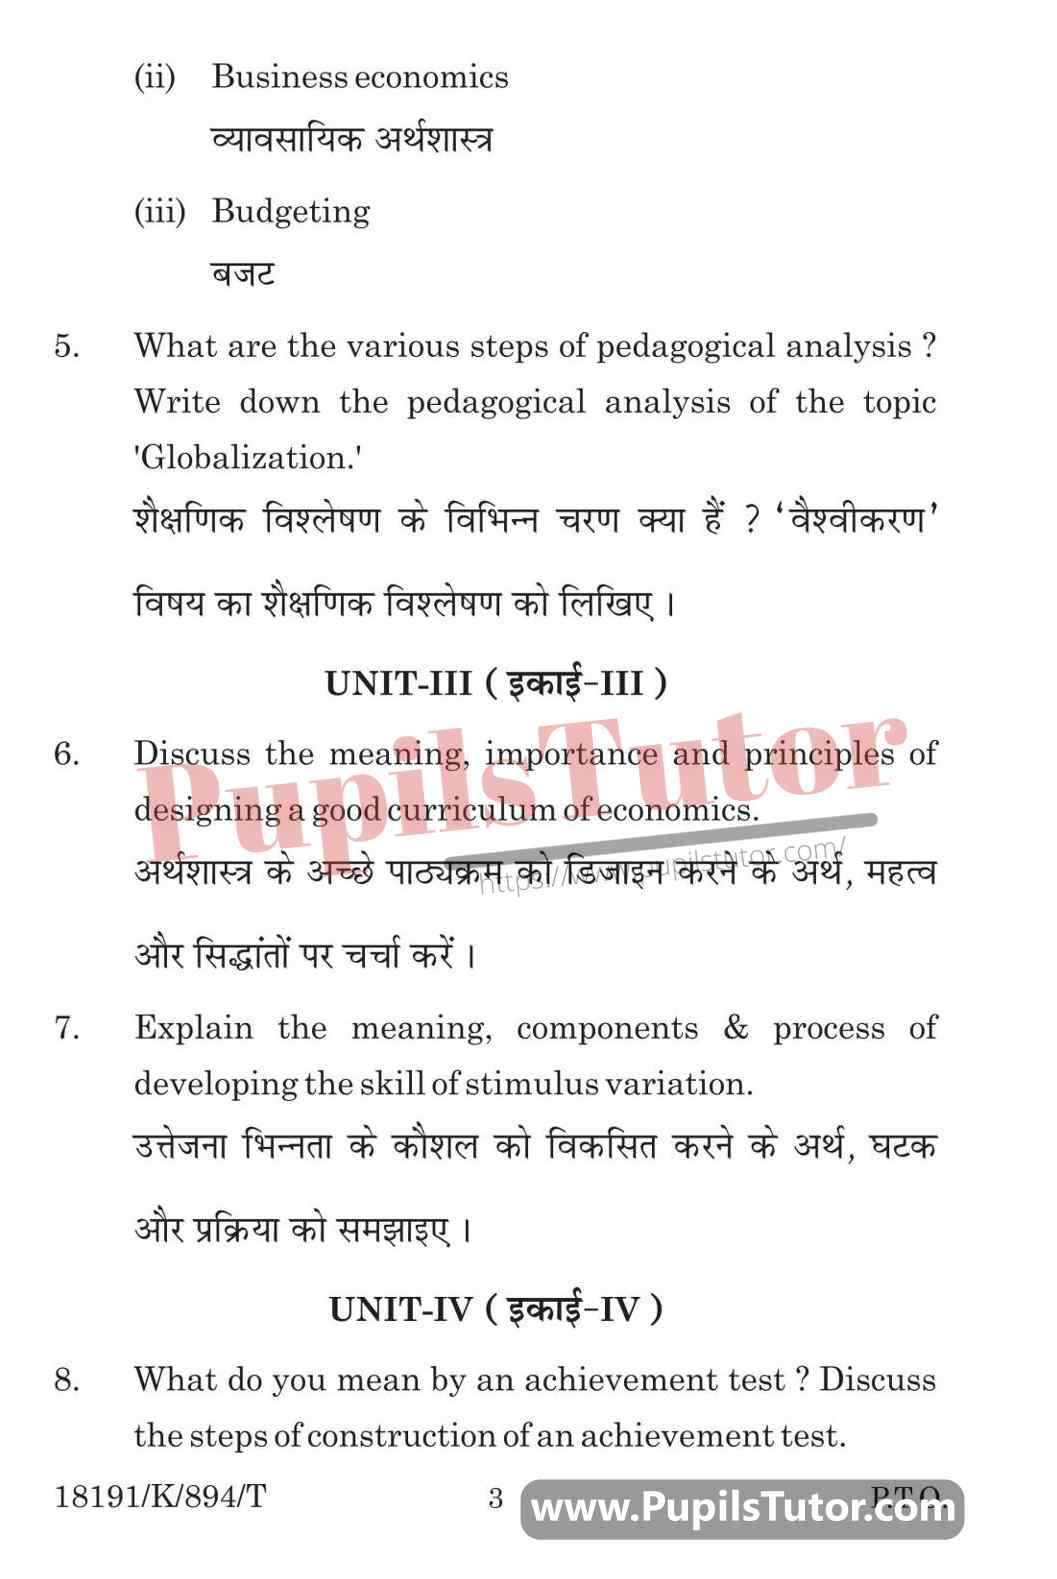 KUK (Kurukshetra University, Haryana) Pedagogy Of Economics Question Paper 2020 For B.Ed 1st And 2nd Year And All The 4 Semesters In English And Hindi Medium Free Download PDF - Page 3 - pupilstutor